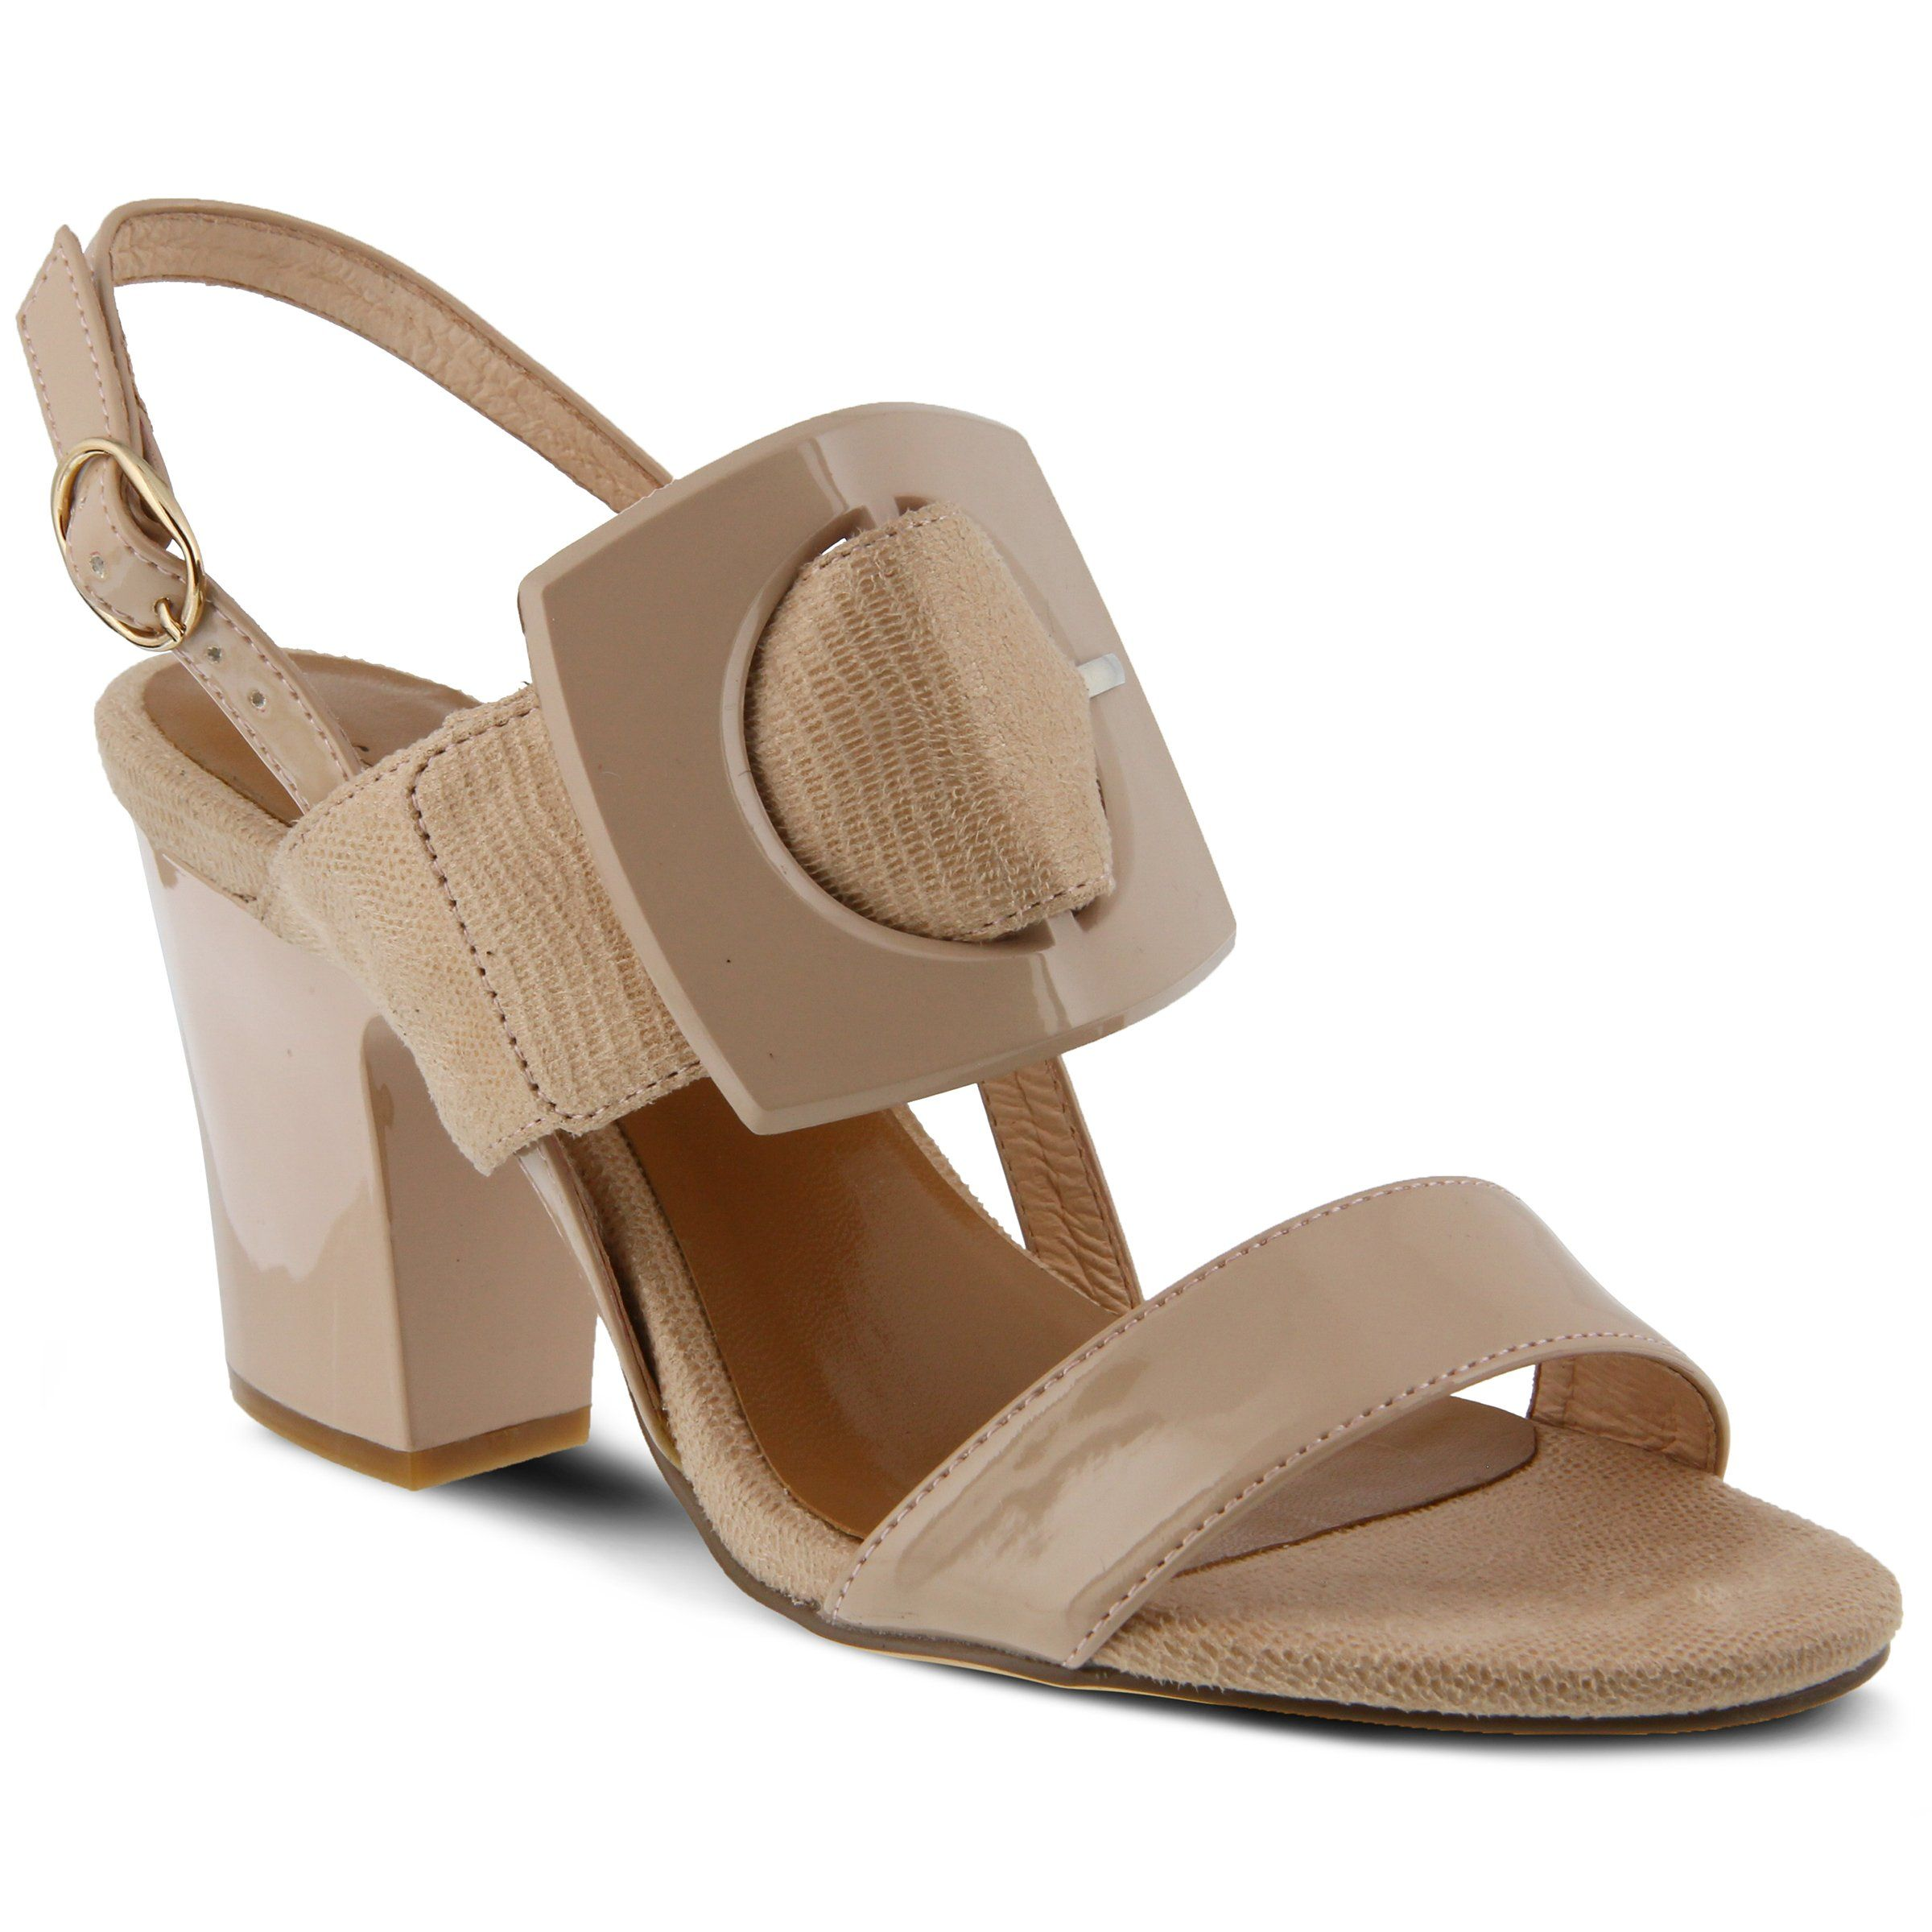 0a7becc4c01 LASKA SANDAL Dress Sandals